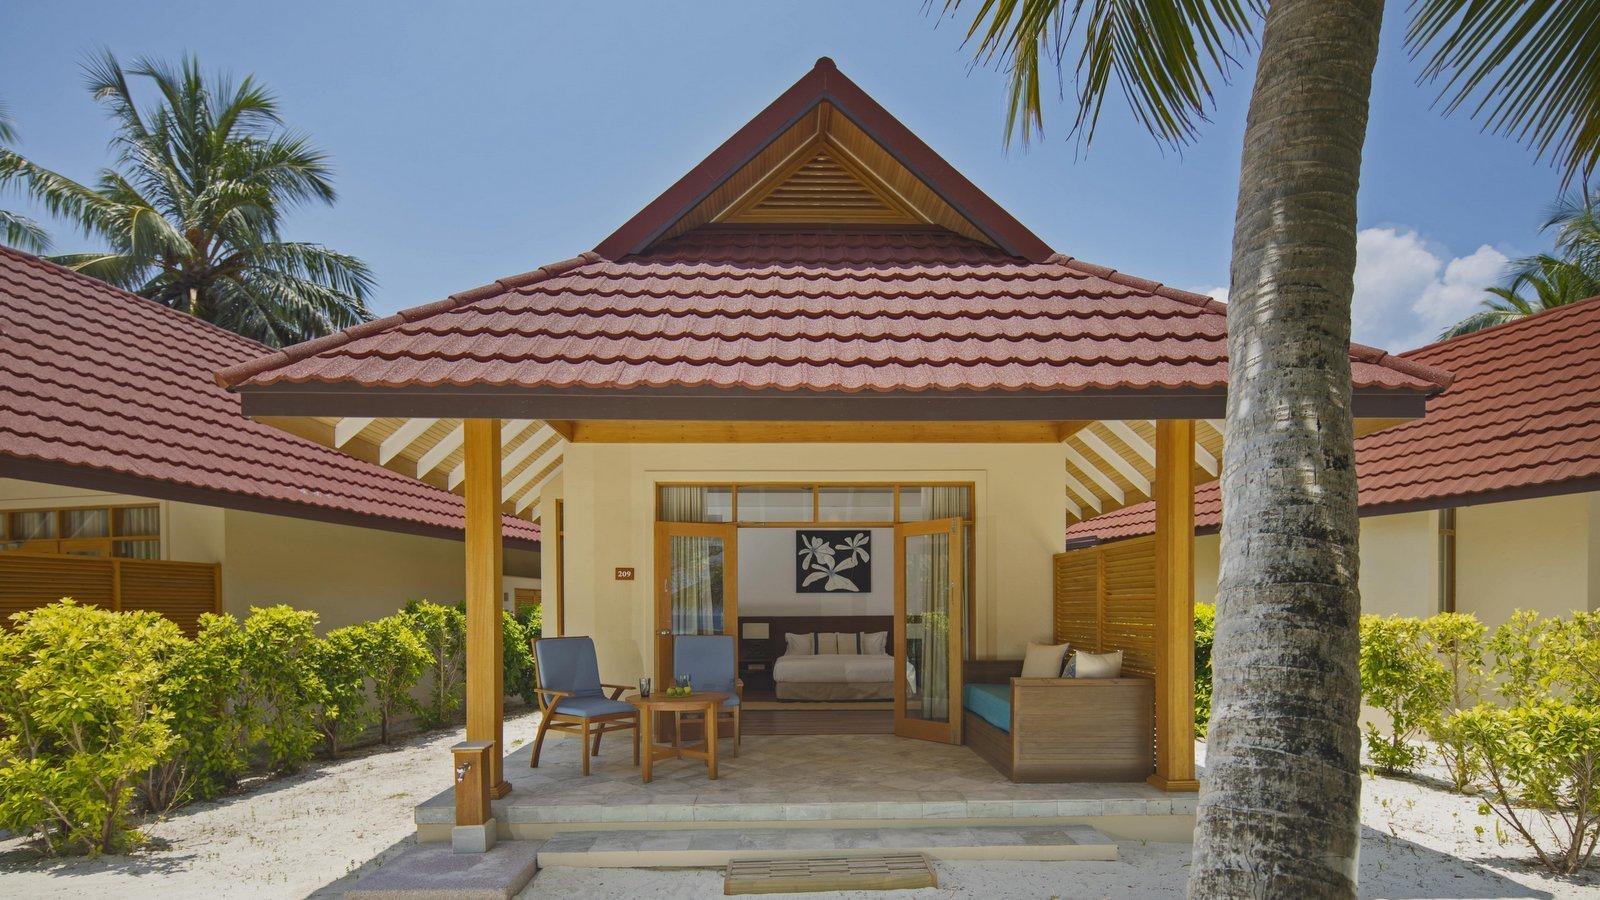 Мальдивы, отель Kurumba Maldives, номер Beach Front Deluxe Bungalow